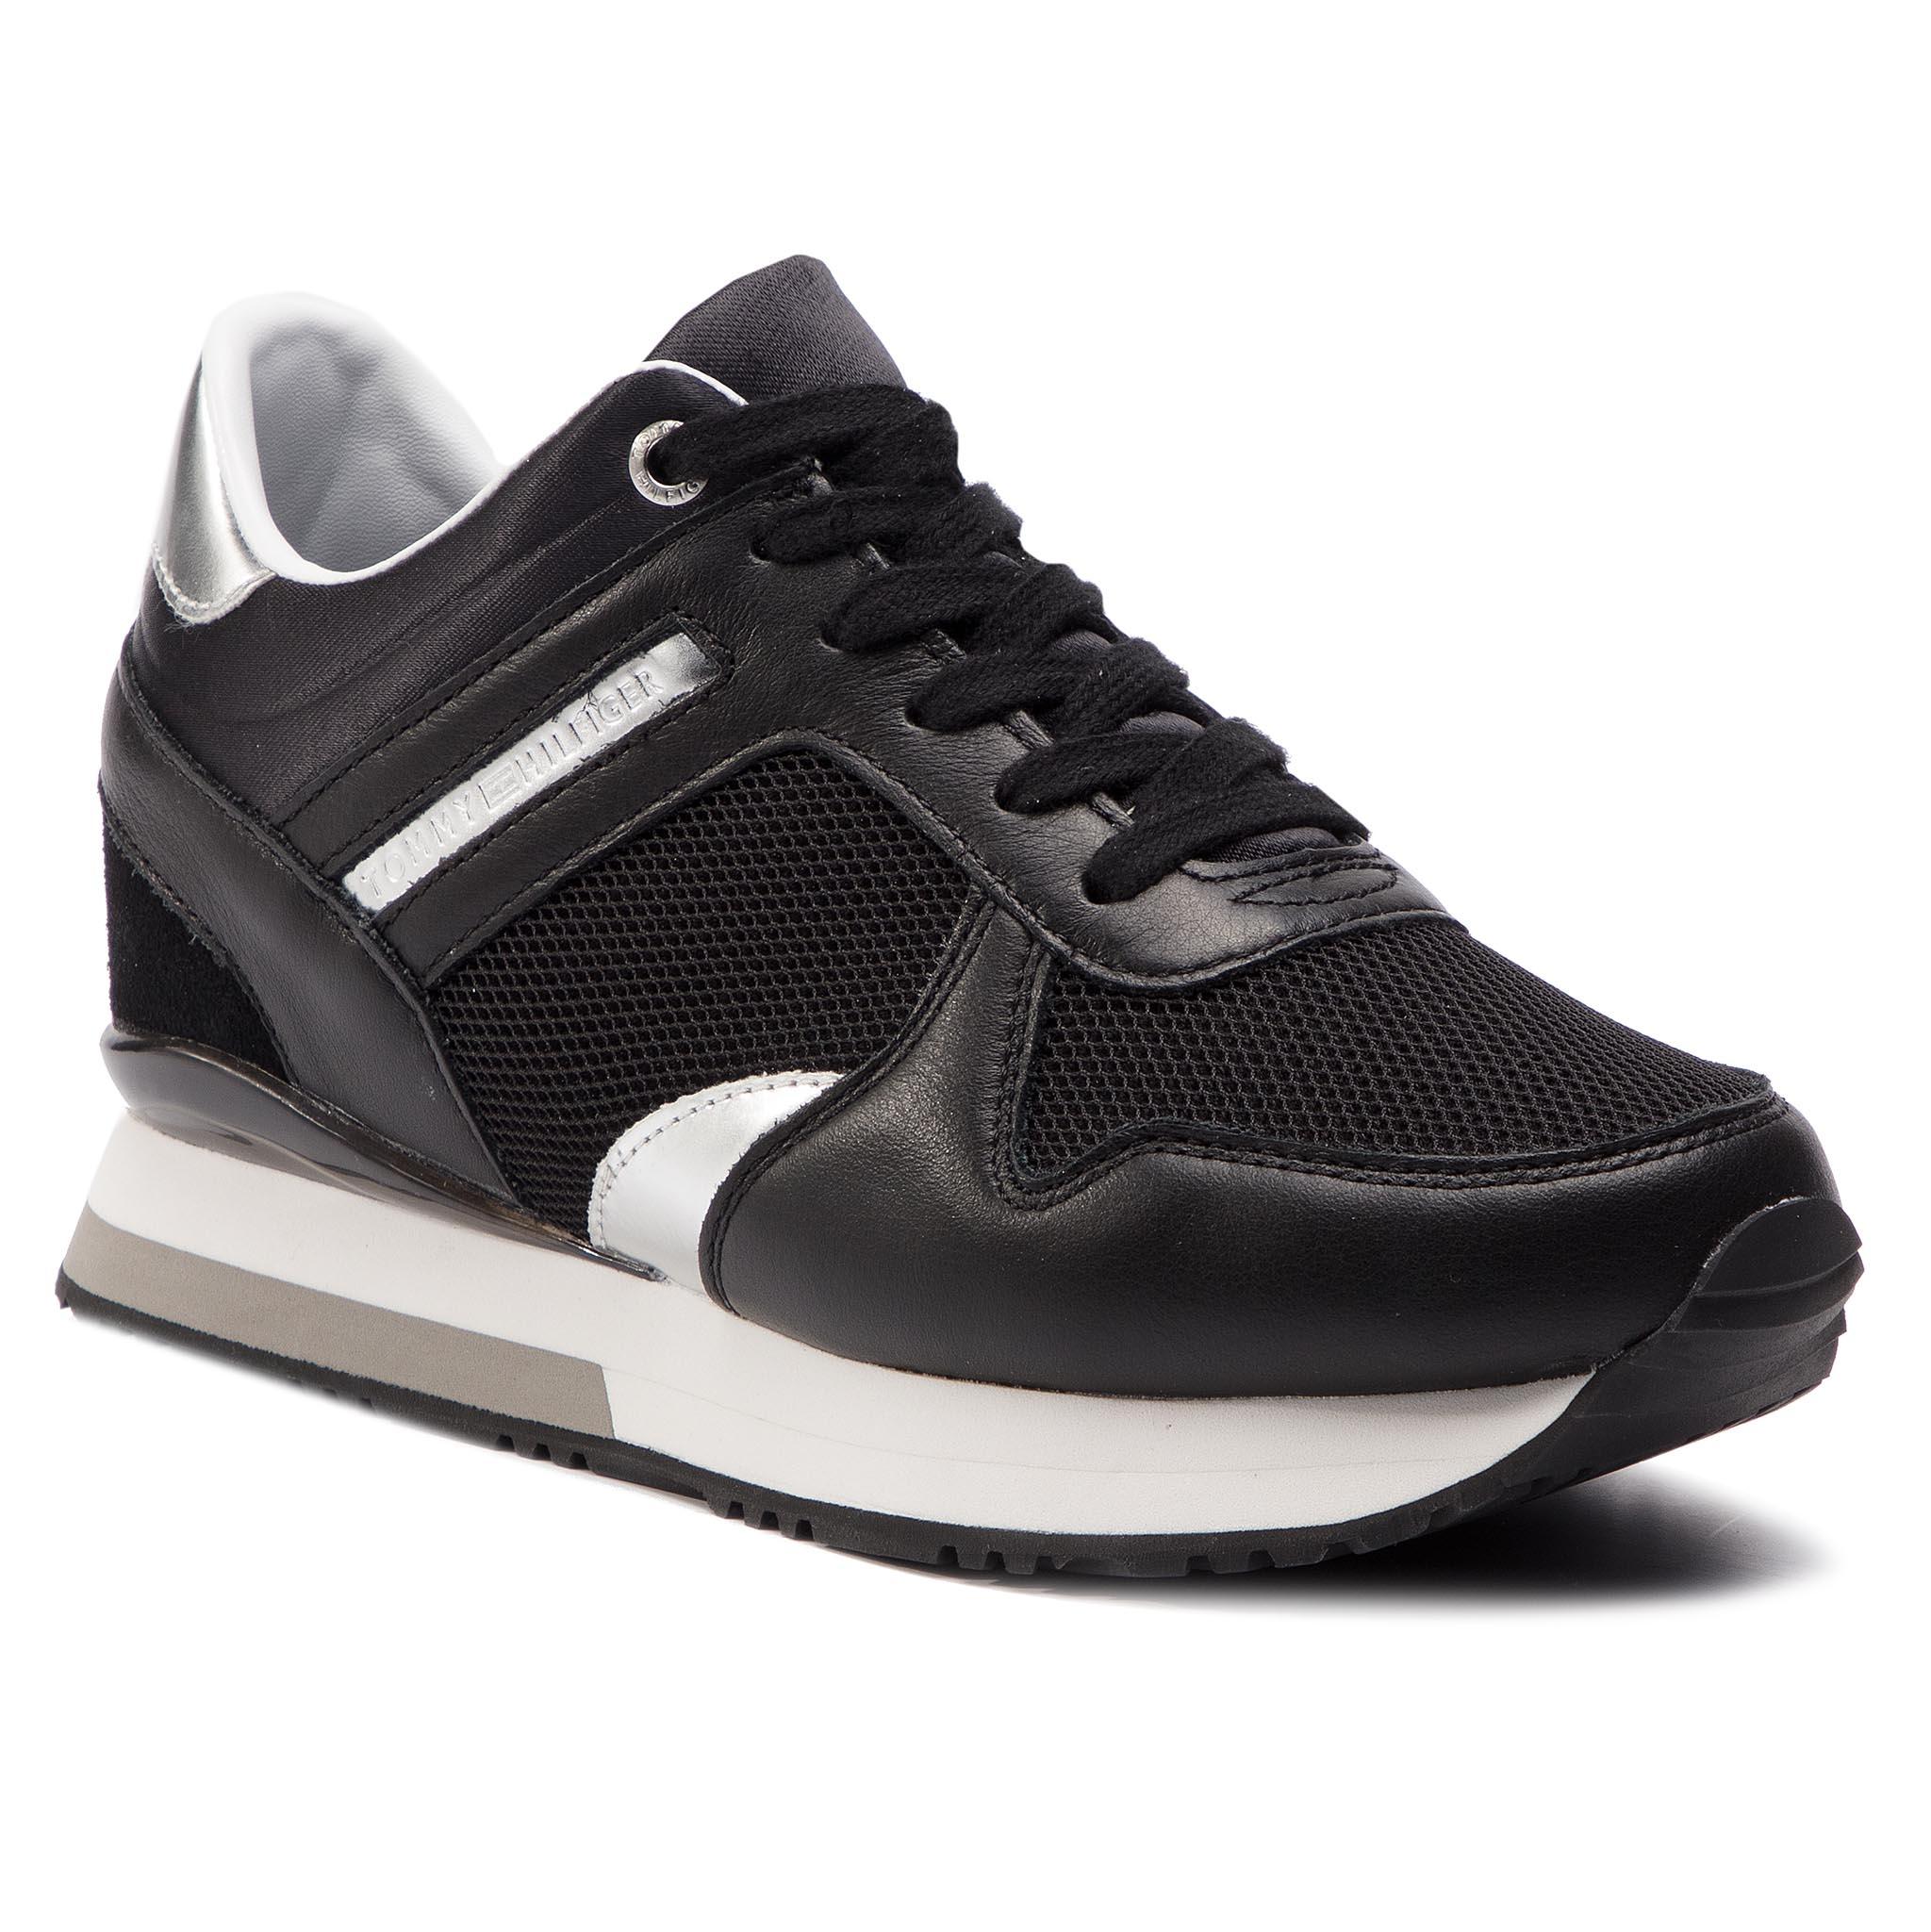 ... TOMMY HILFIGER - Glitter Textile Wedge Sneaker FW0FW03893 Black 990.  -6%. Sportcipő ... 345b82070f